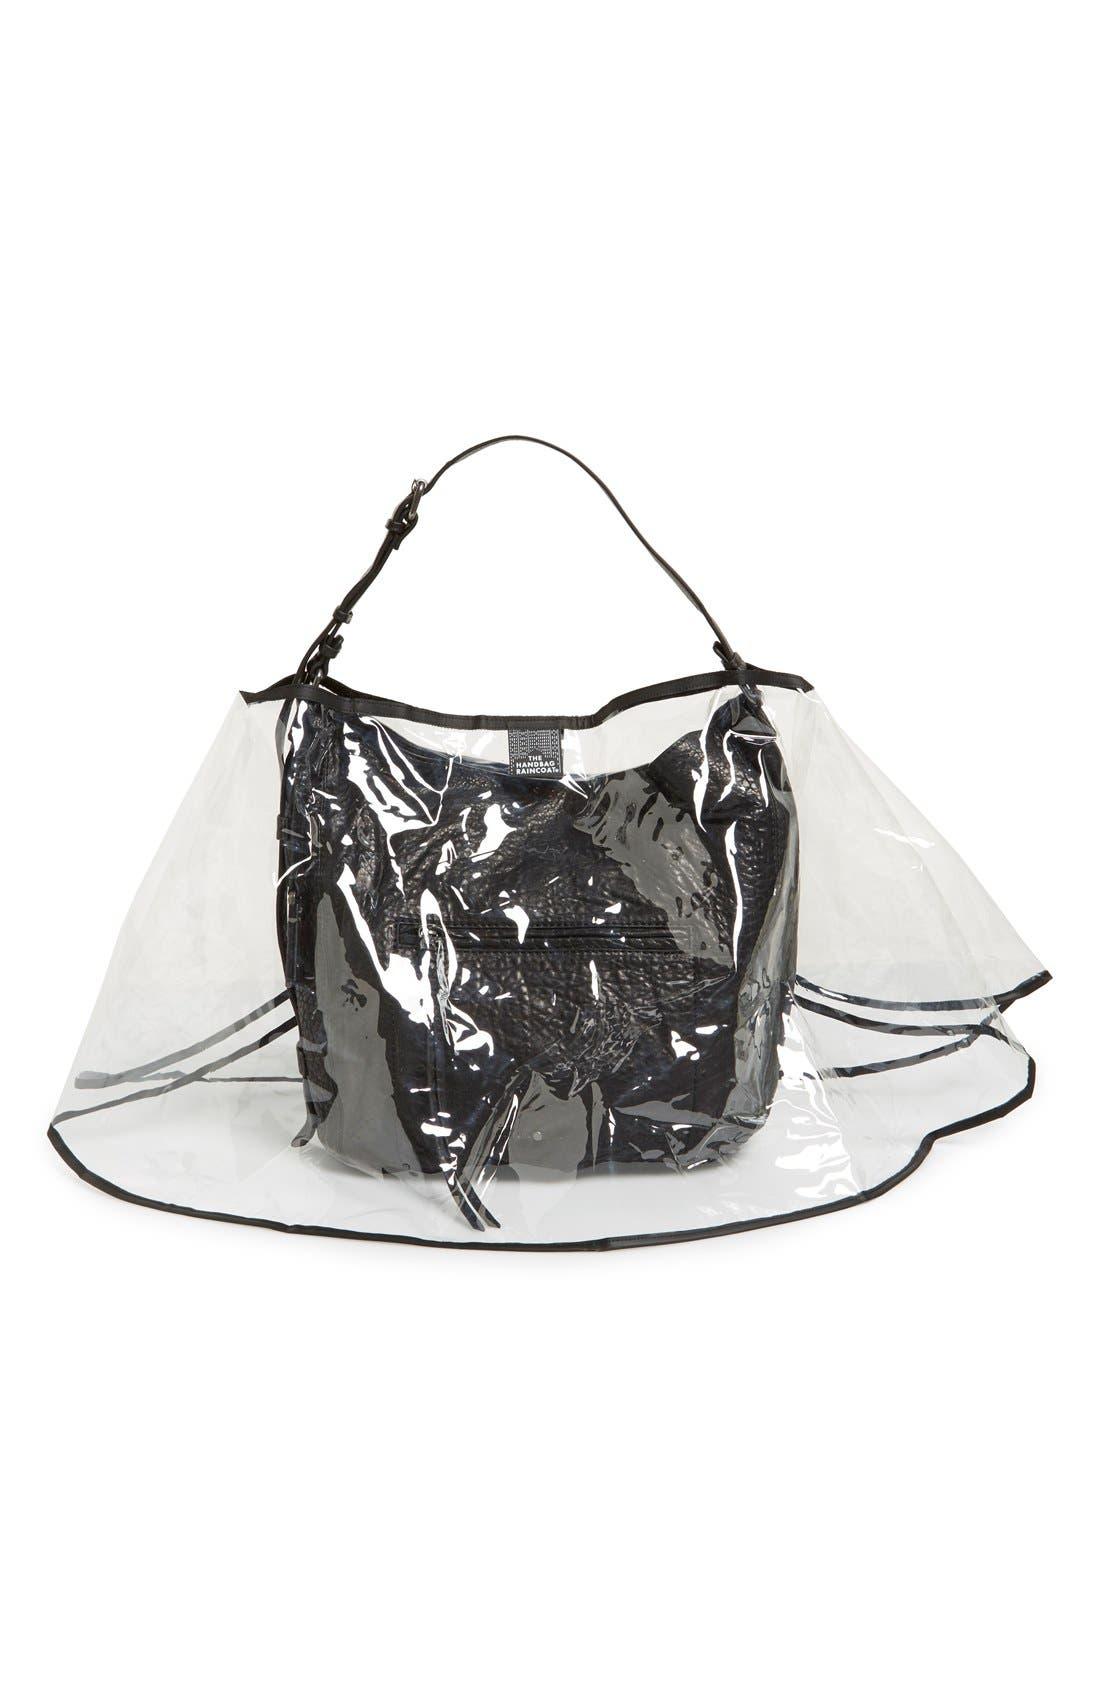 'Maxi - City Slicker' Handbag Protector,                             Alternate thumbnail 2, color,